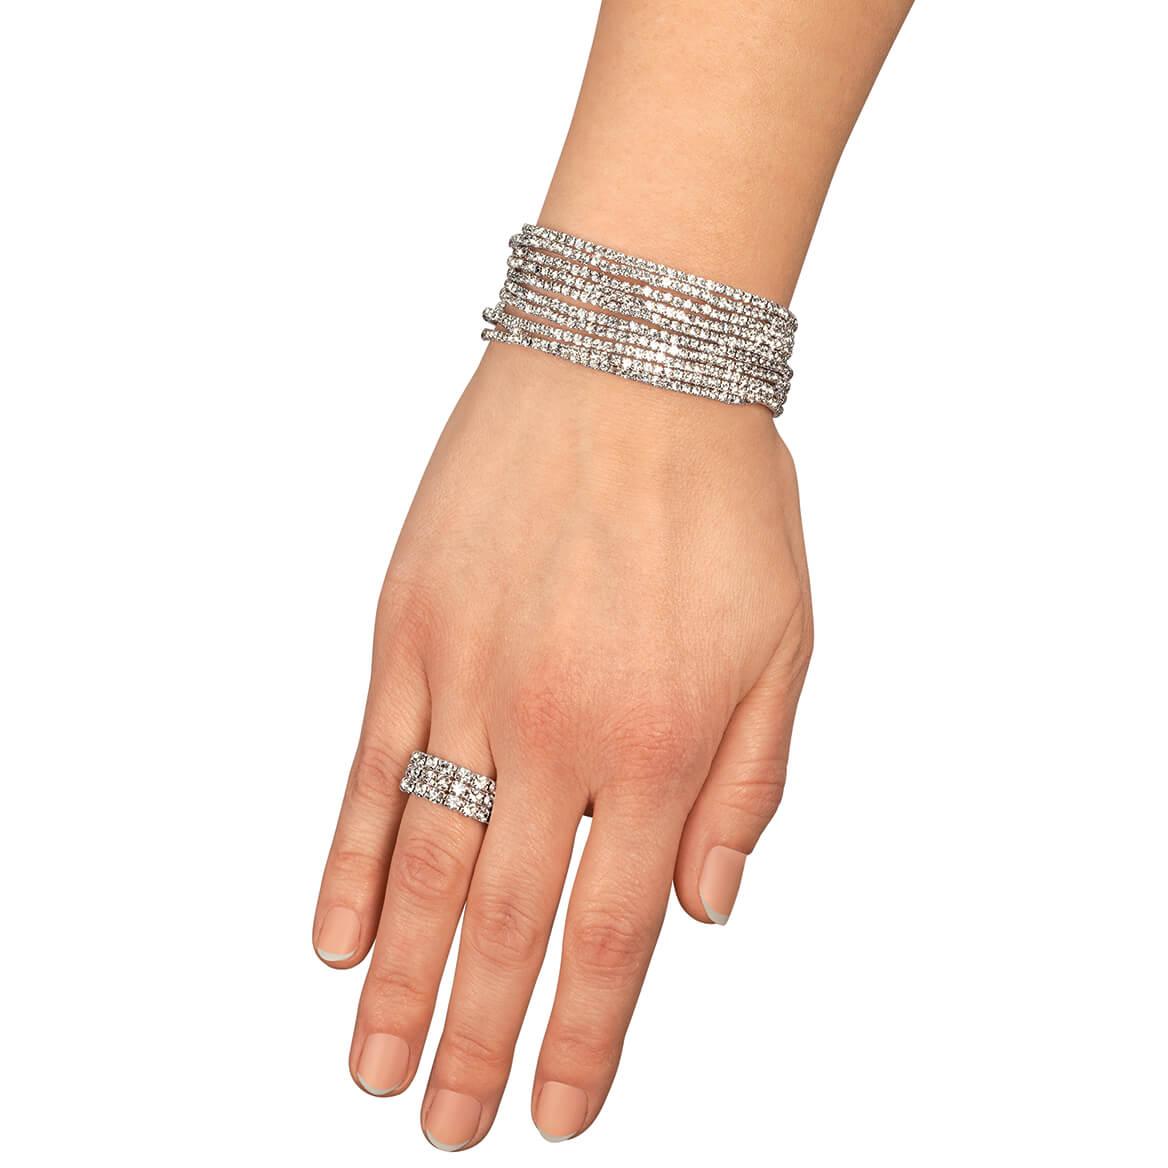 Set of 10 Crystal Bracelets and Stretch Ring-370586